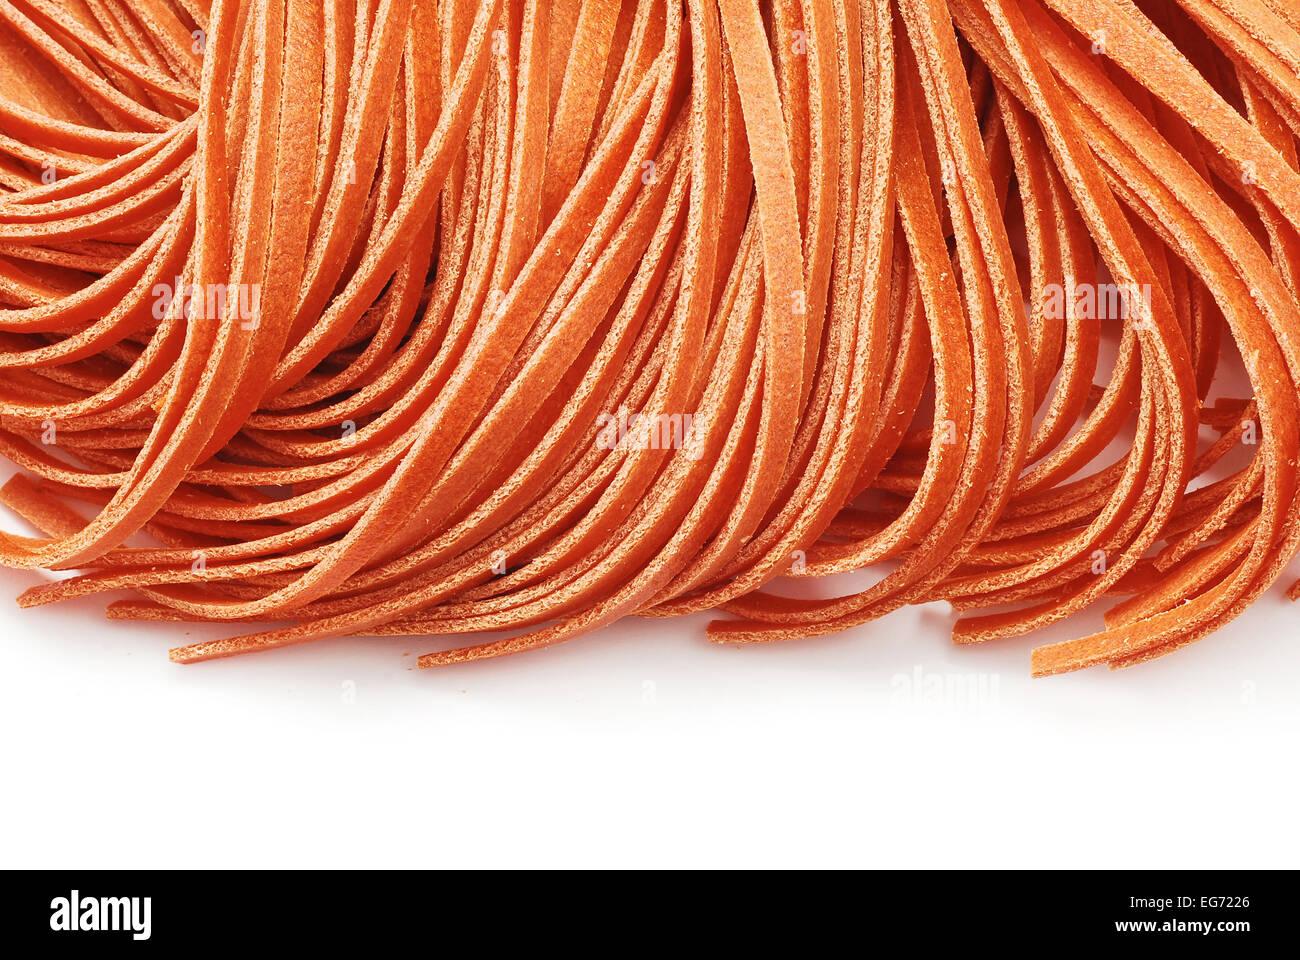 fettuccine red pasta on white - Stock Image